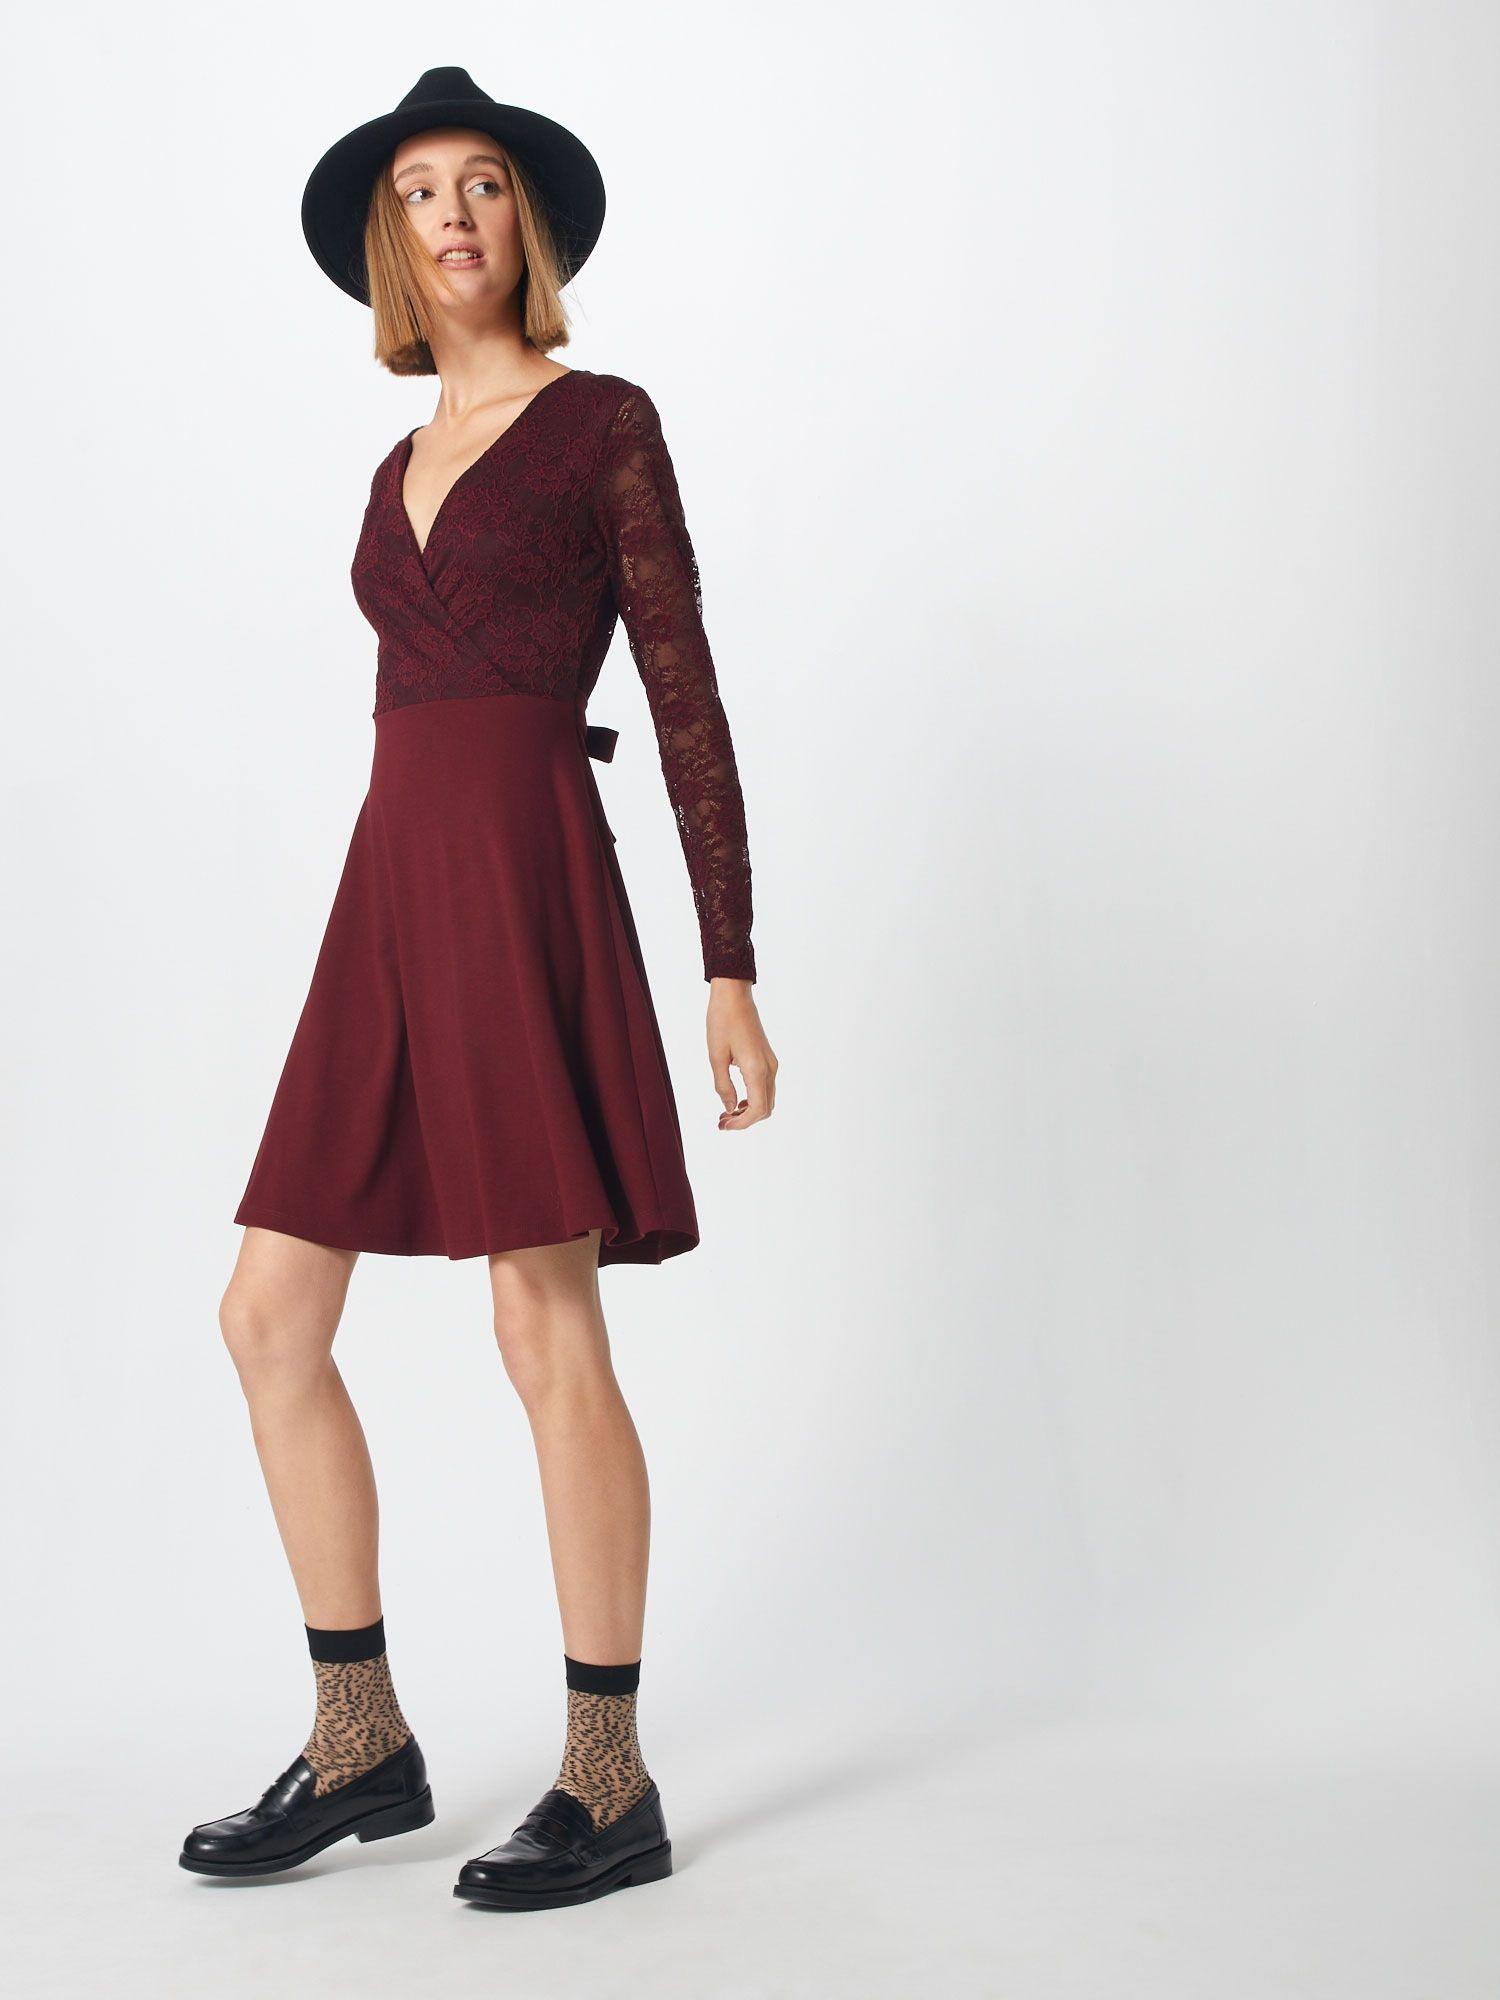 ABOUT YOU Kleid 'Olivia' Damen, Bordeaux, Größe 42 | Kleider